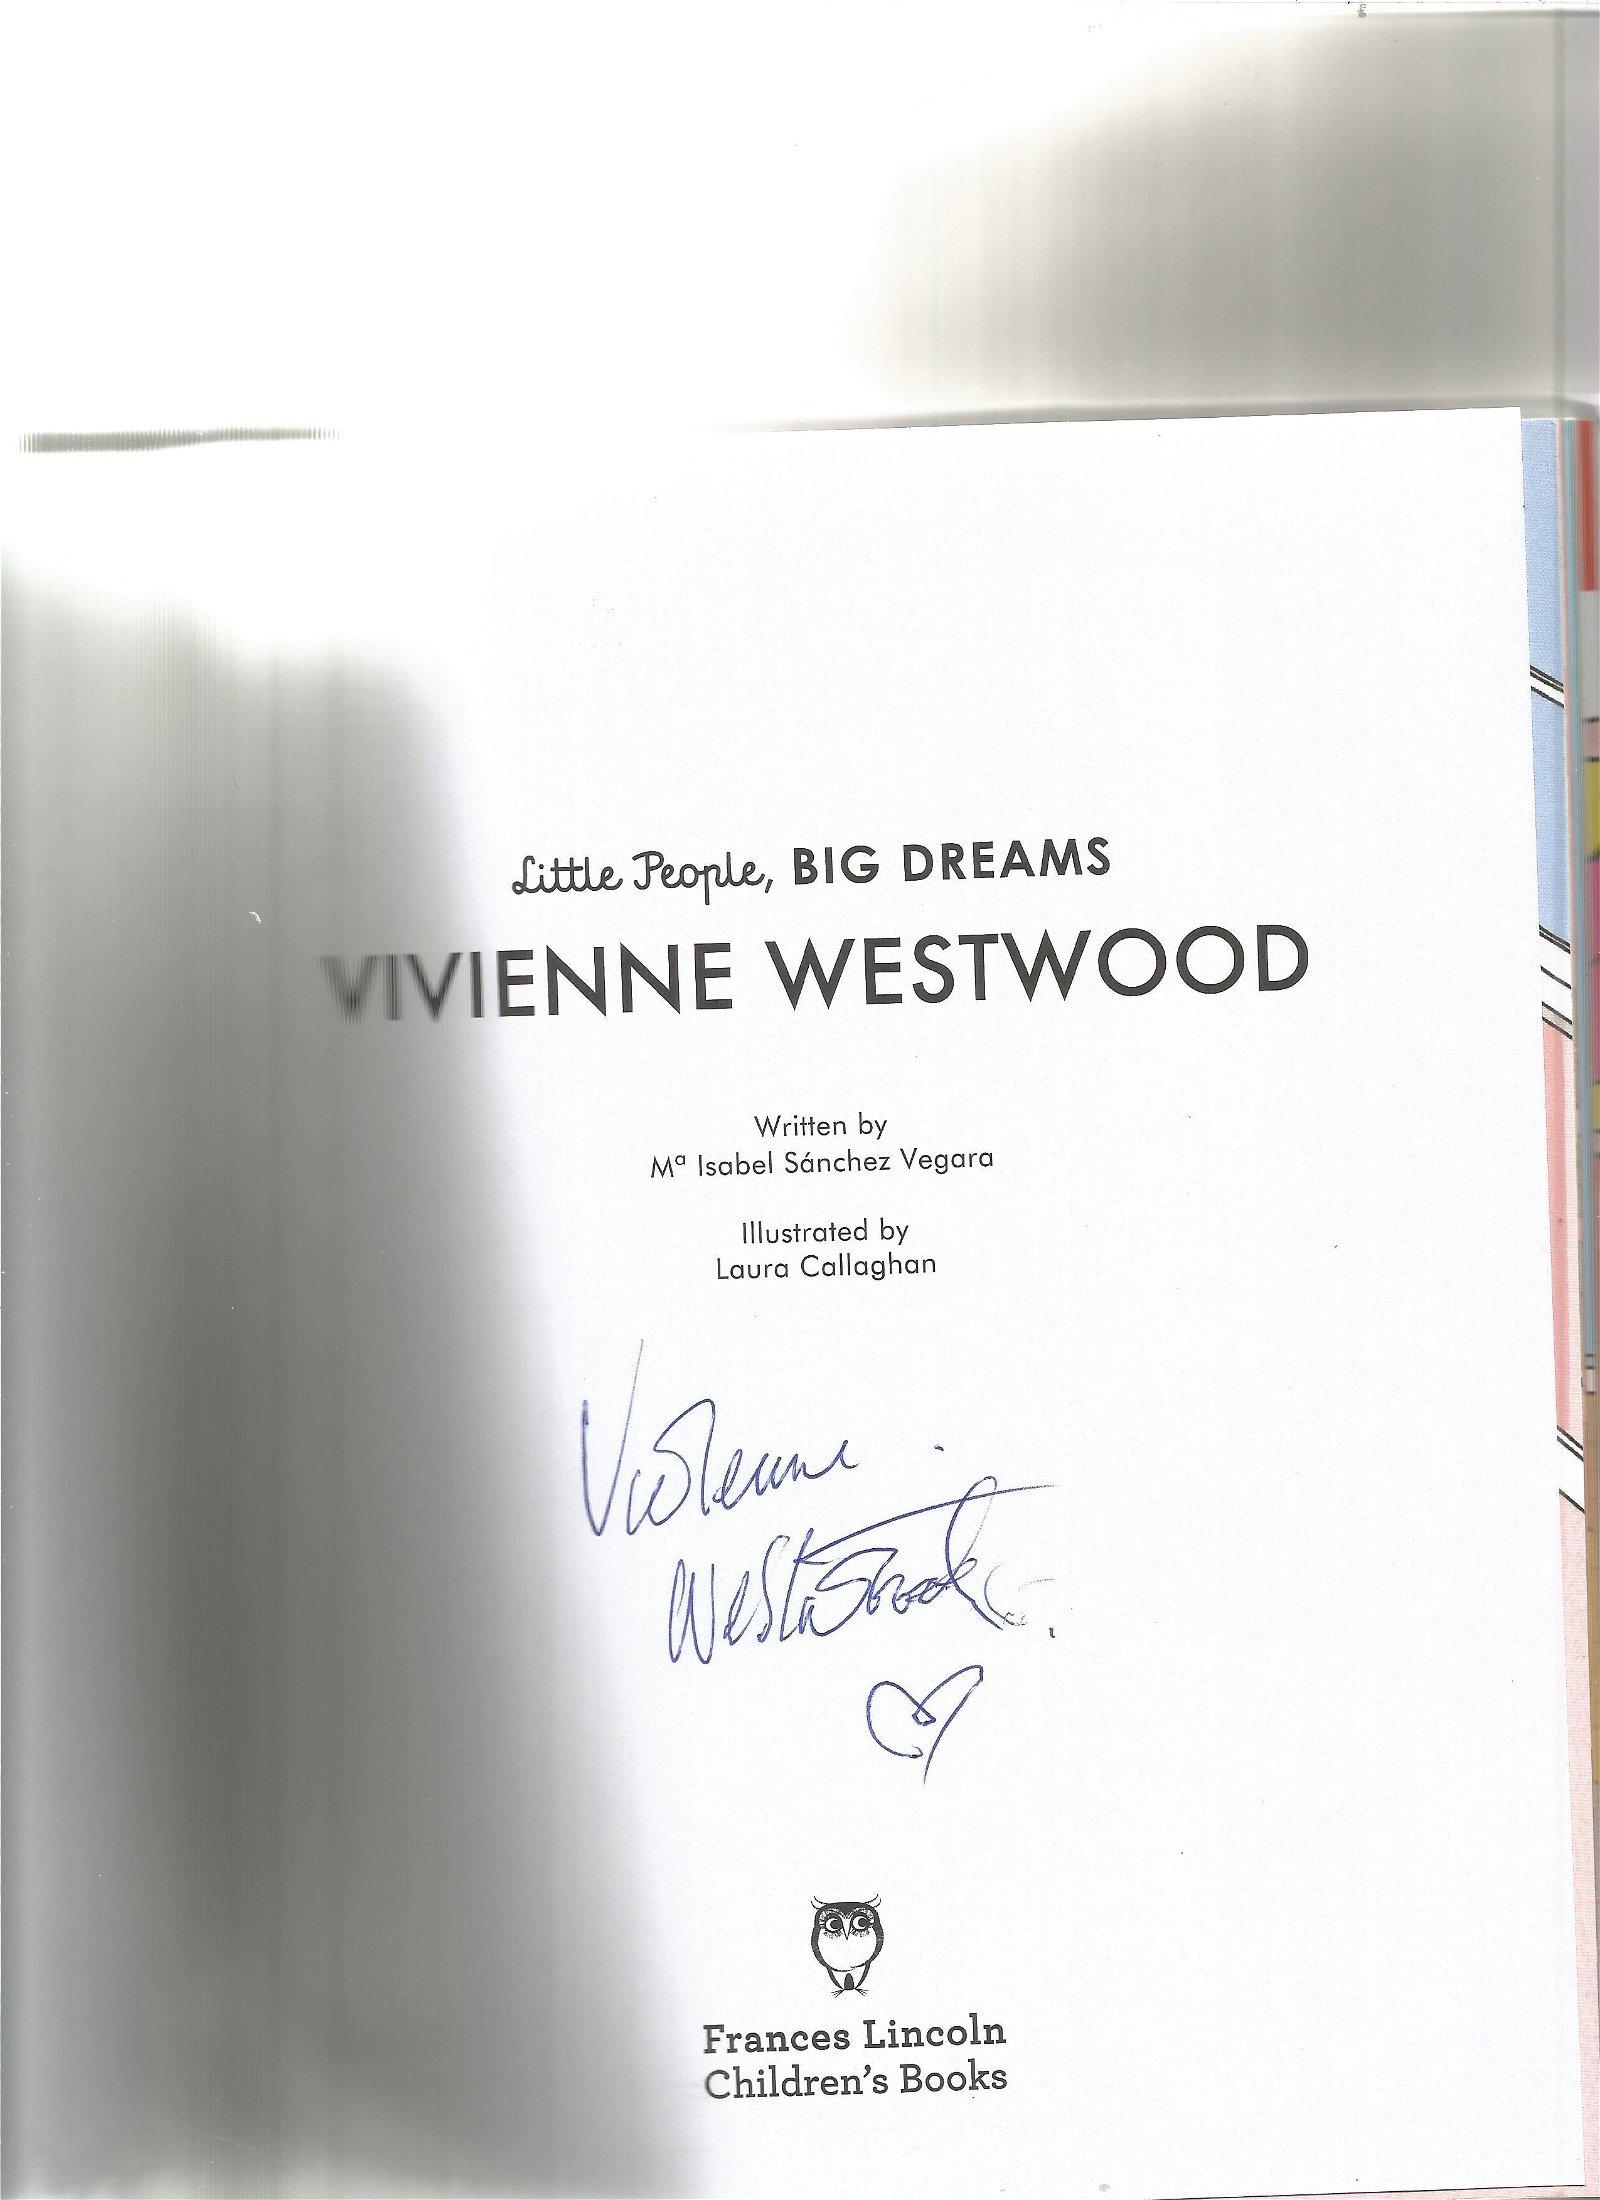 Vivienne Westwood signed Little People, Big Dreams